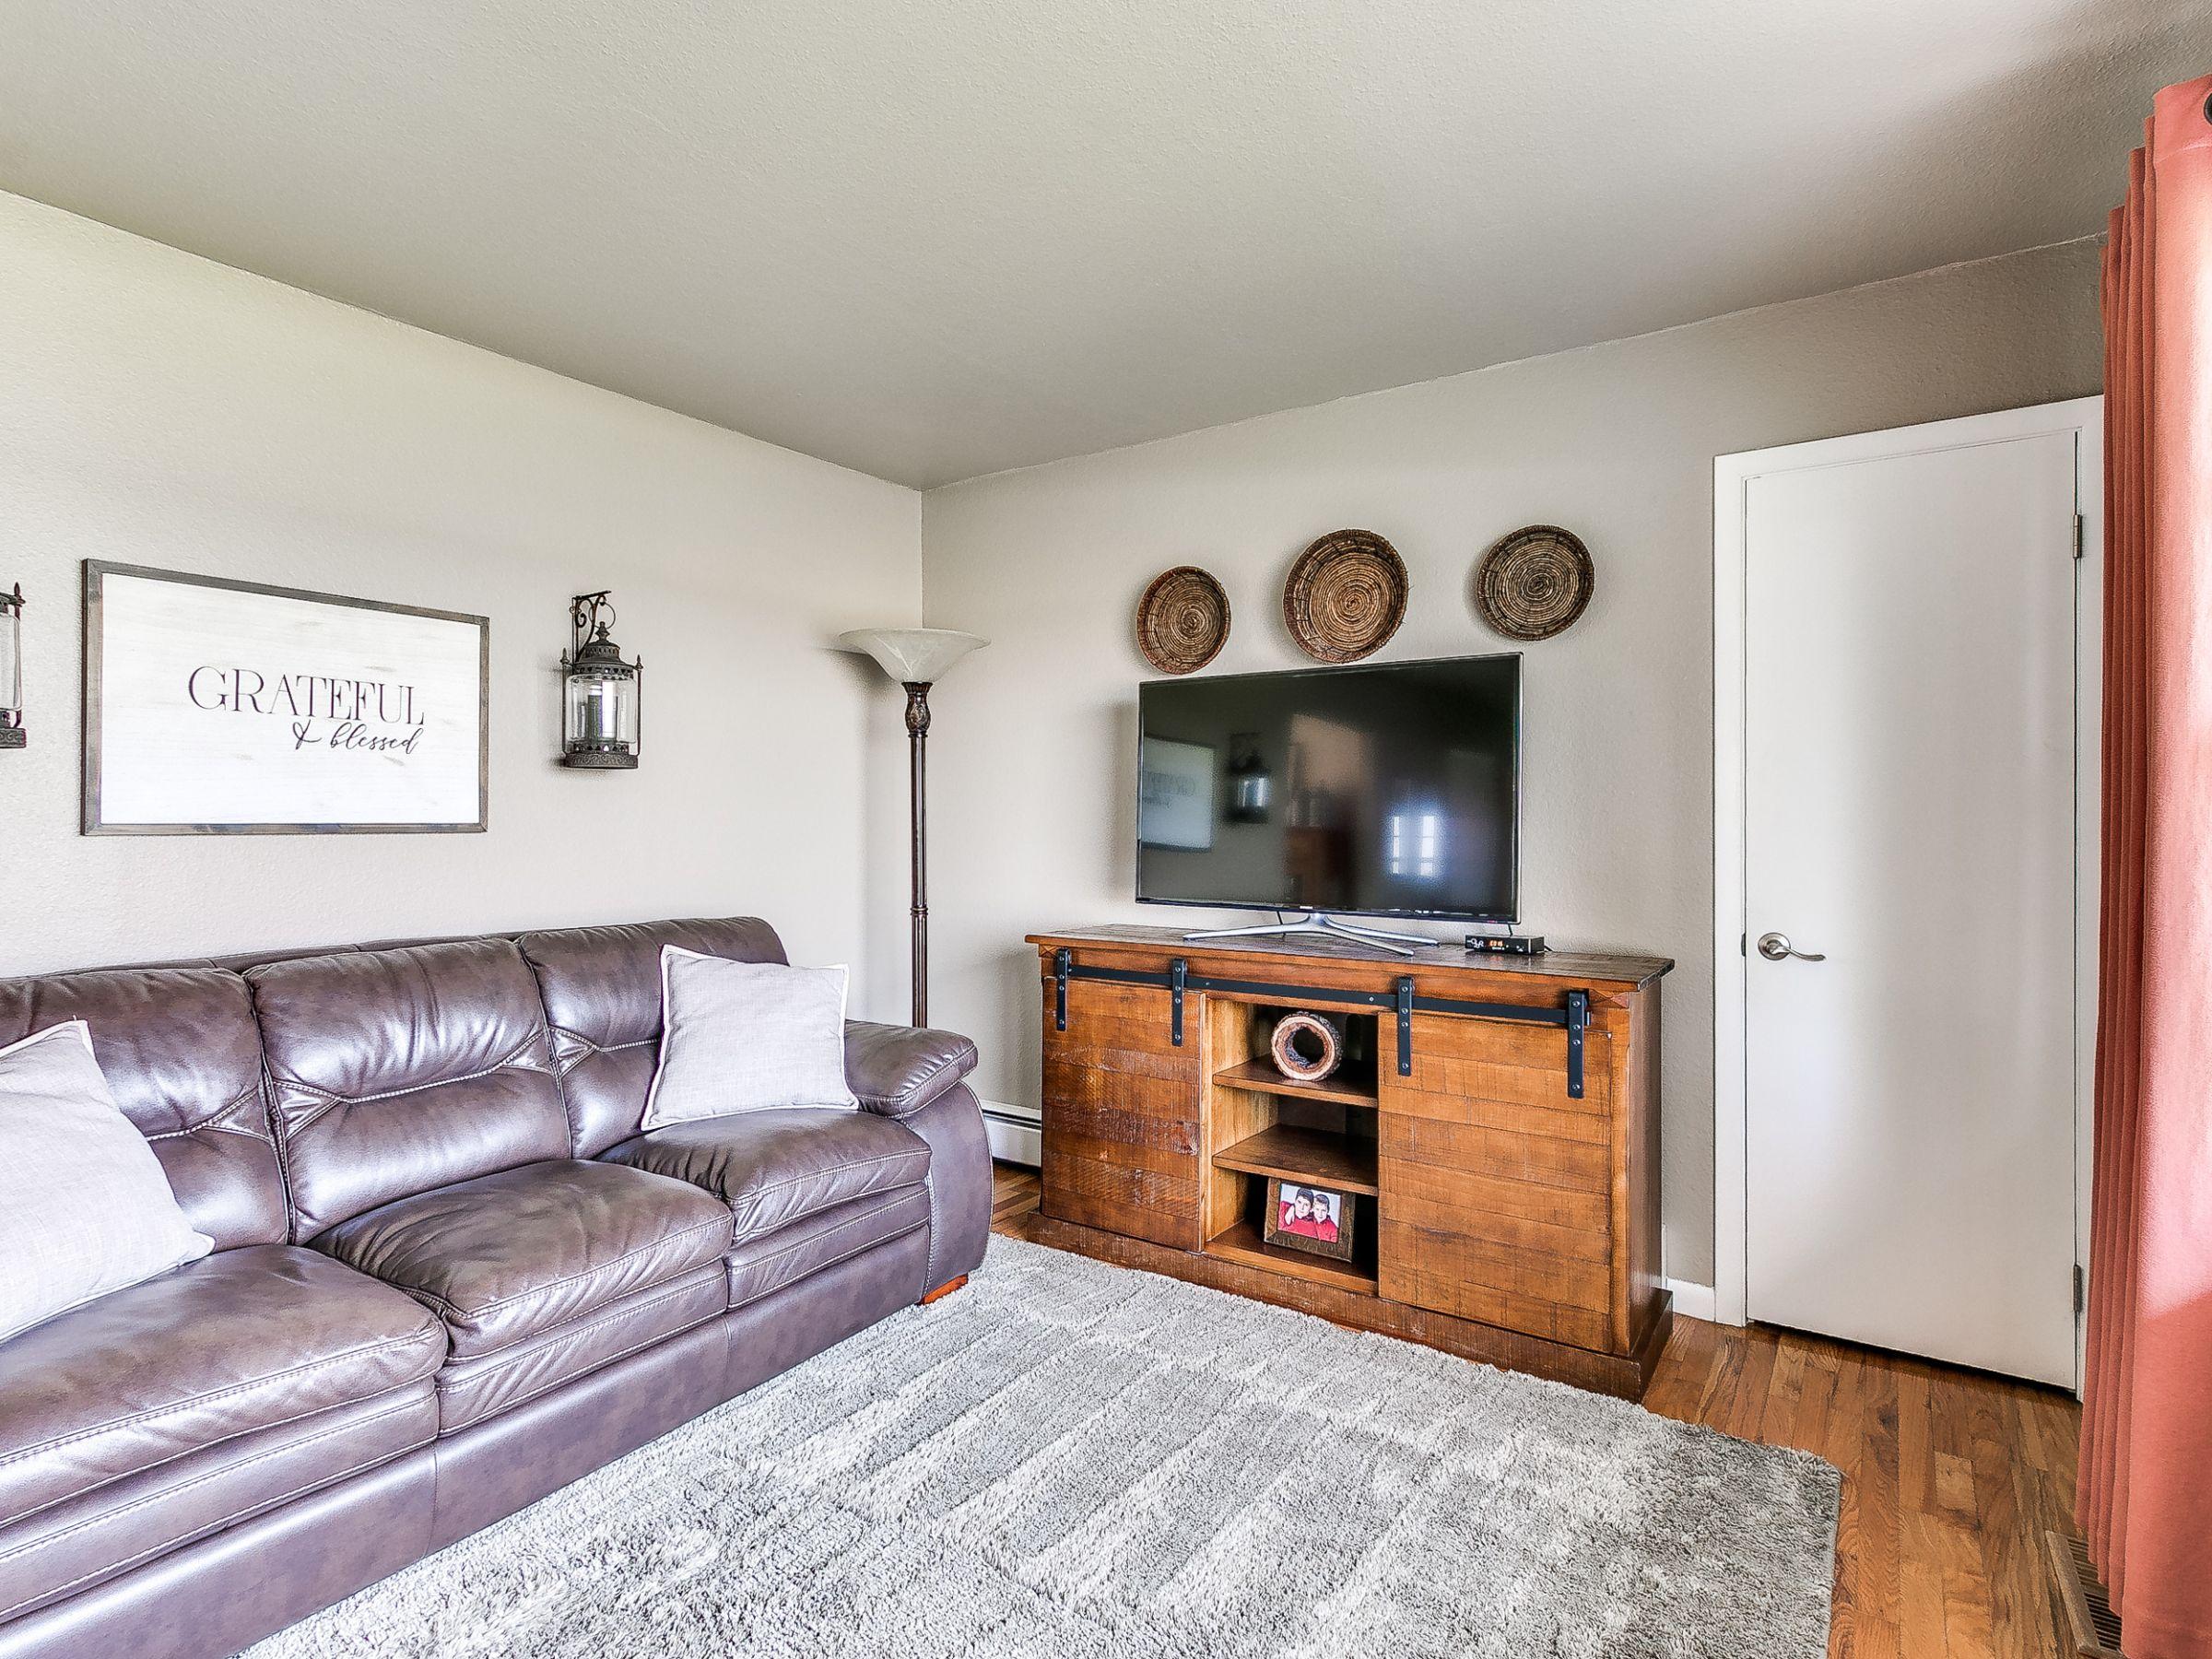 residential-warren-county-iowa-3-acres-listing-number-15516-3-2021-05-12-144930.jpg